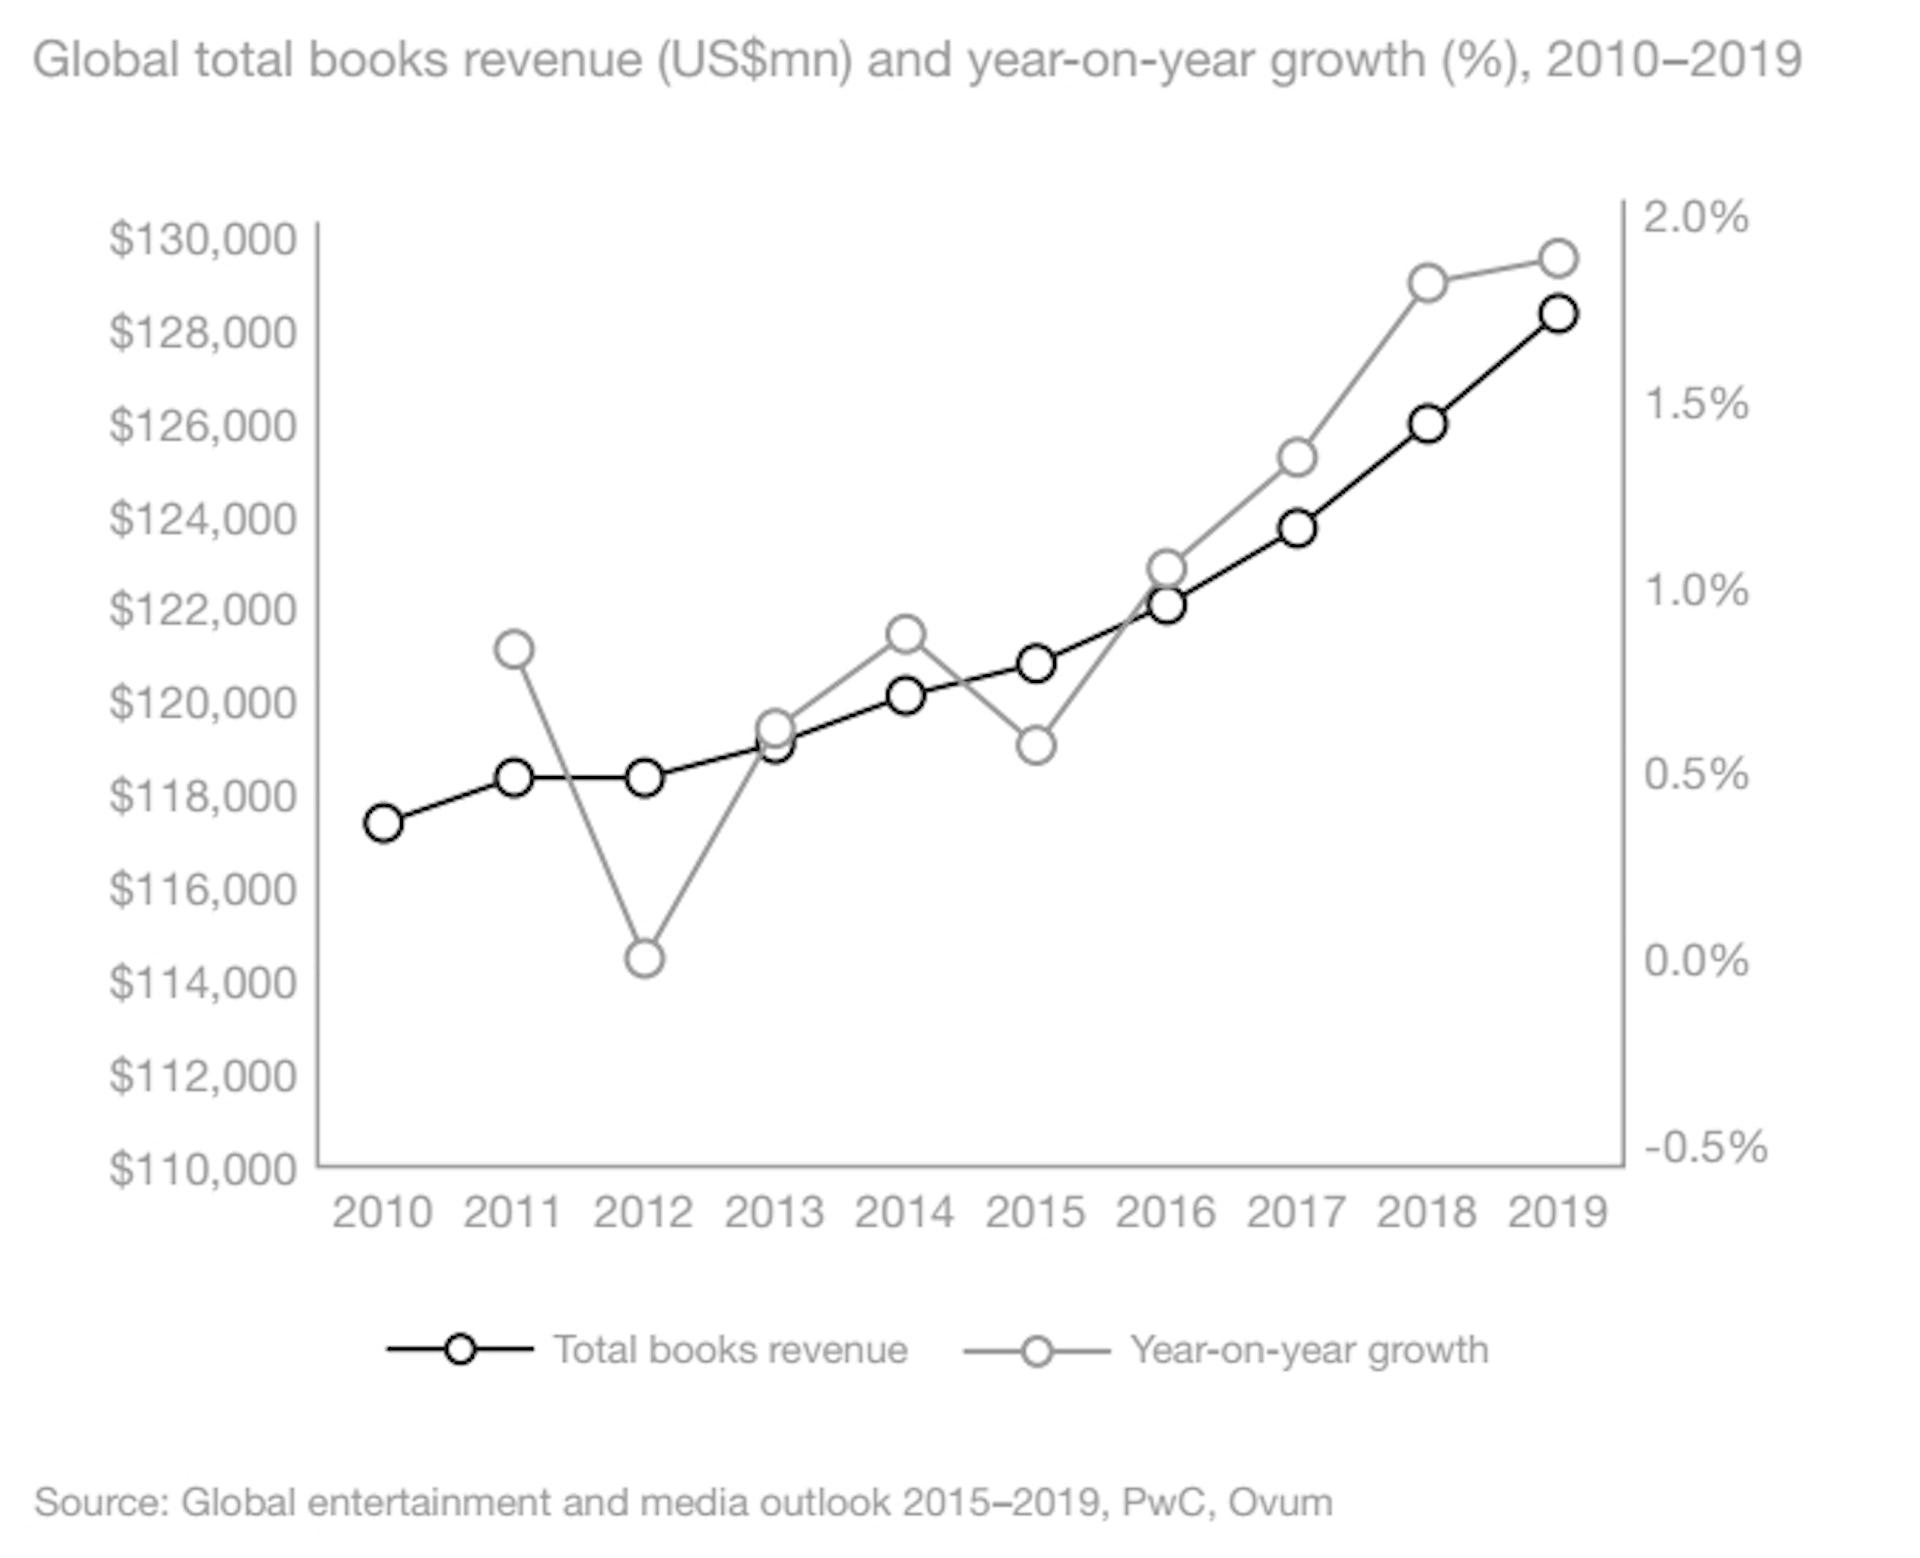 World S Favourite Bookstores Ranking Shows Enduring Market